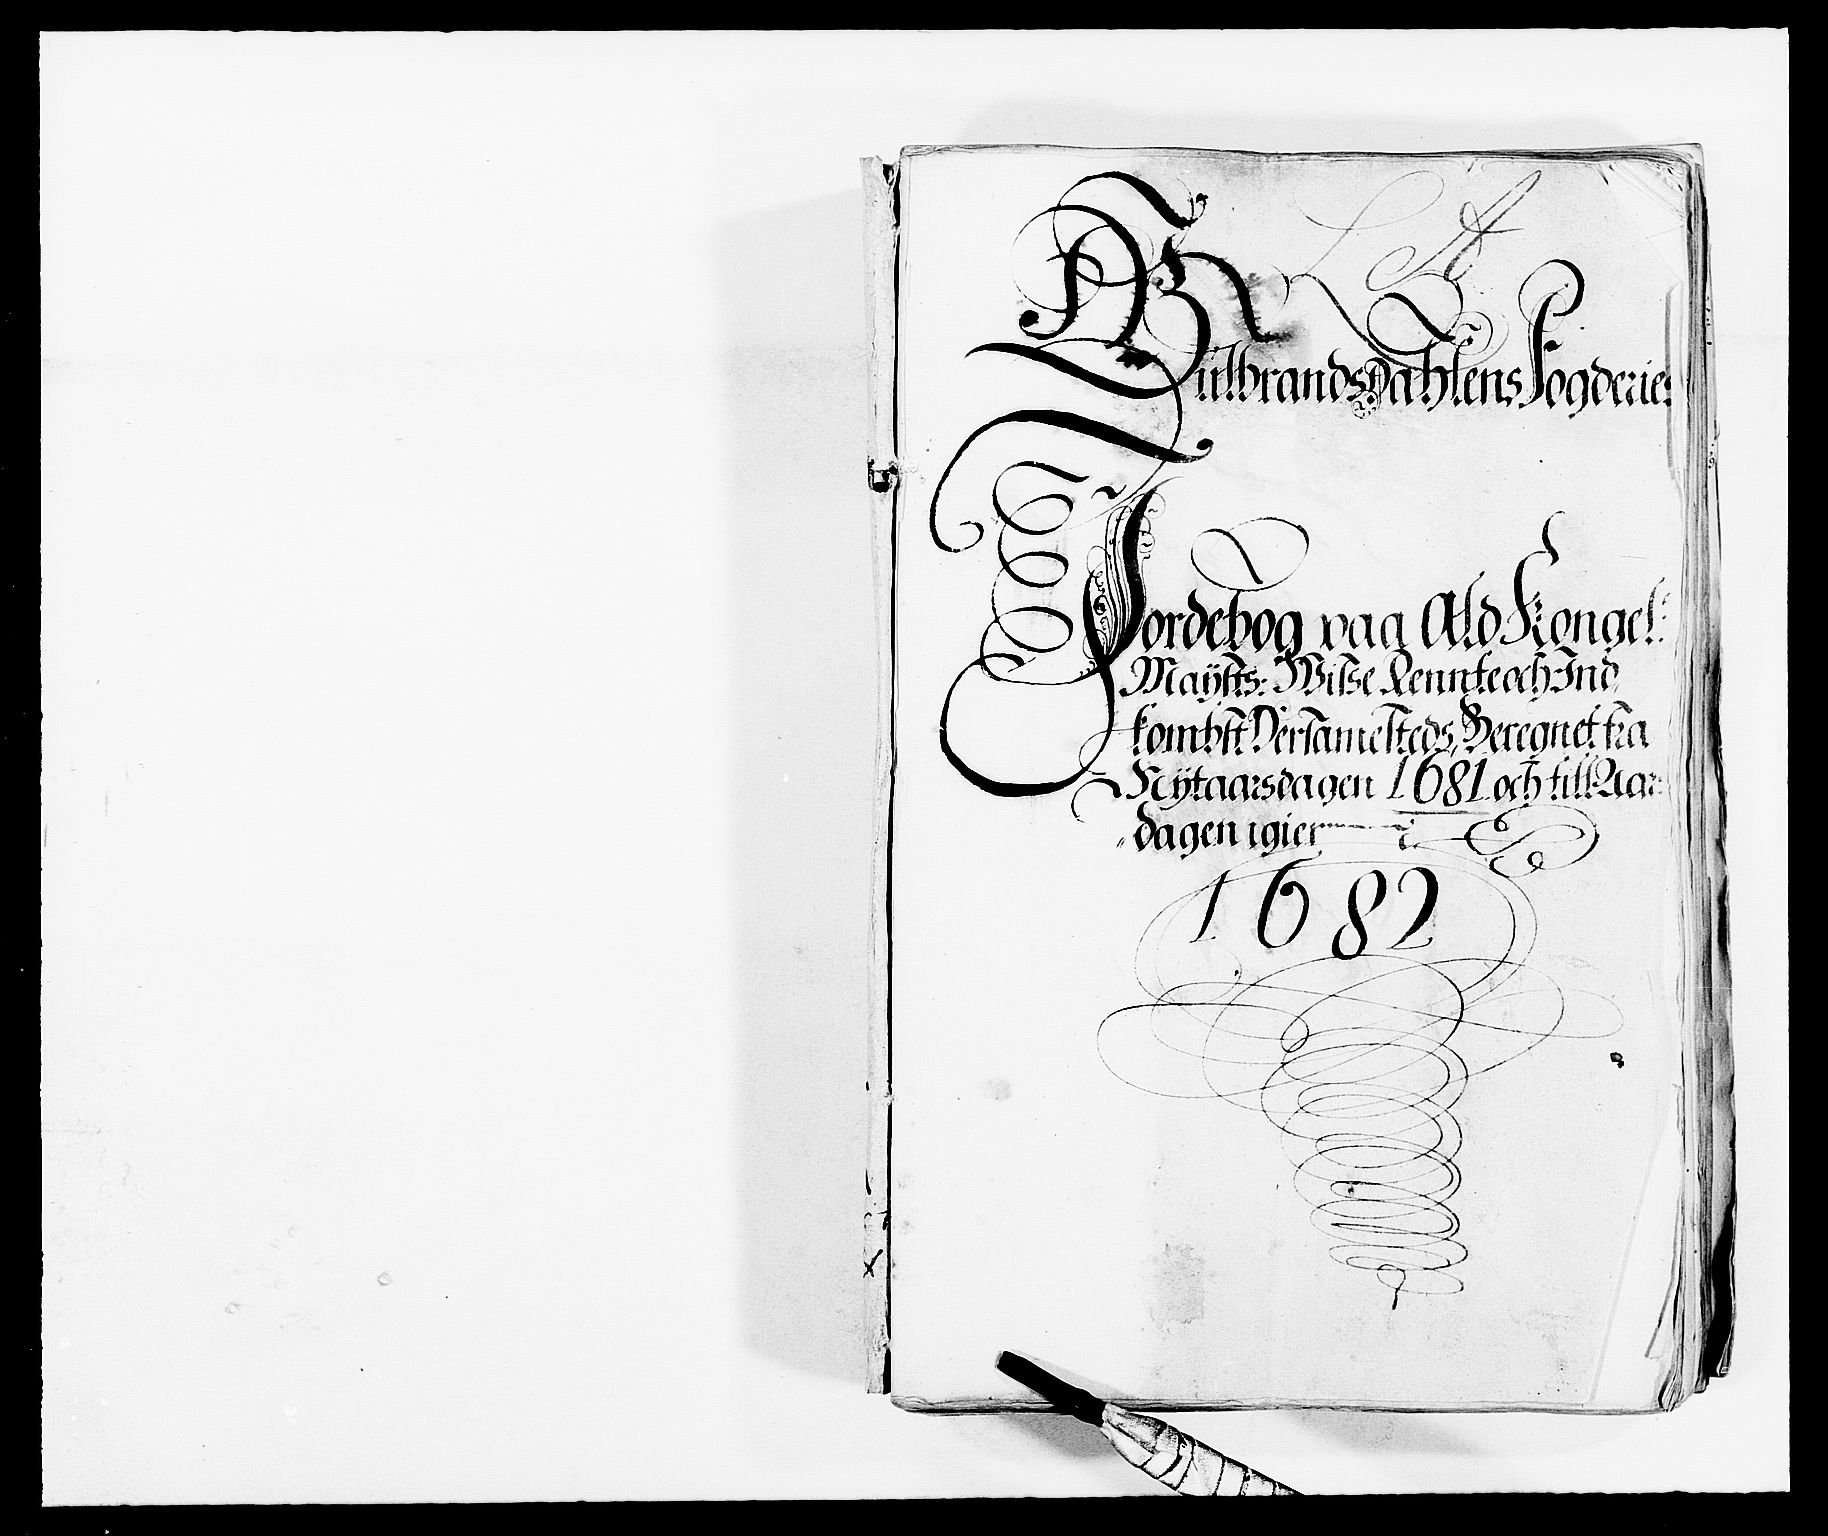 RA, Rentekammeret inntil 1814, Reviderte regnskaper, Fogderegnskap, R17/L1155: Fogderegnskap Gudbrandsdal, 1681, s. 17